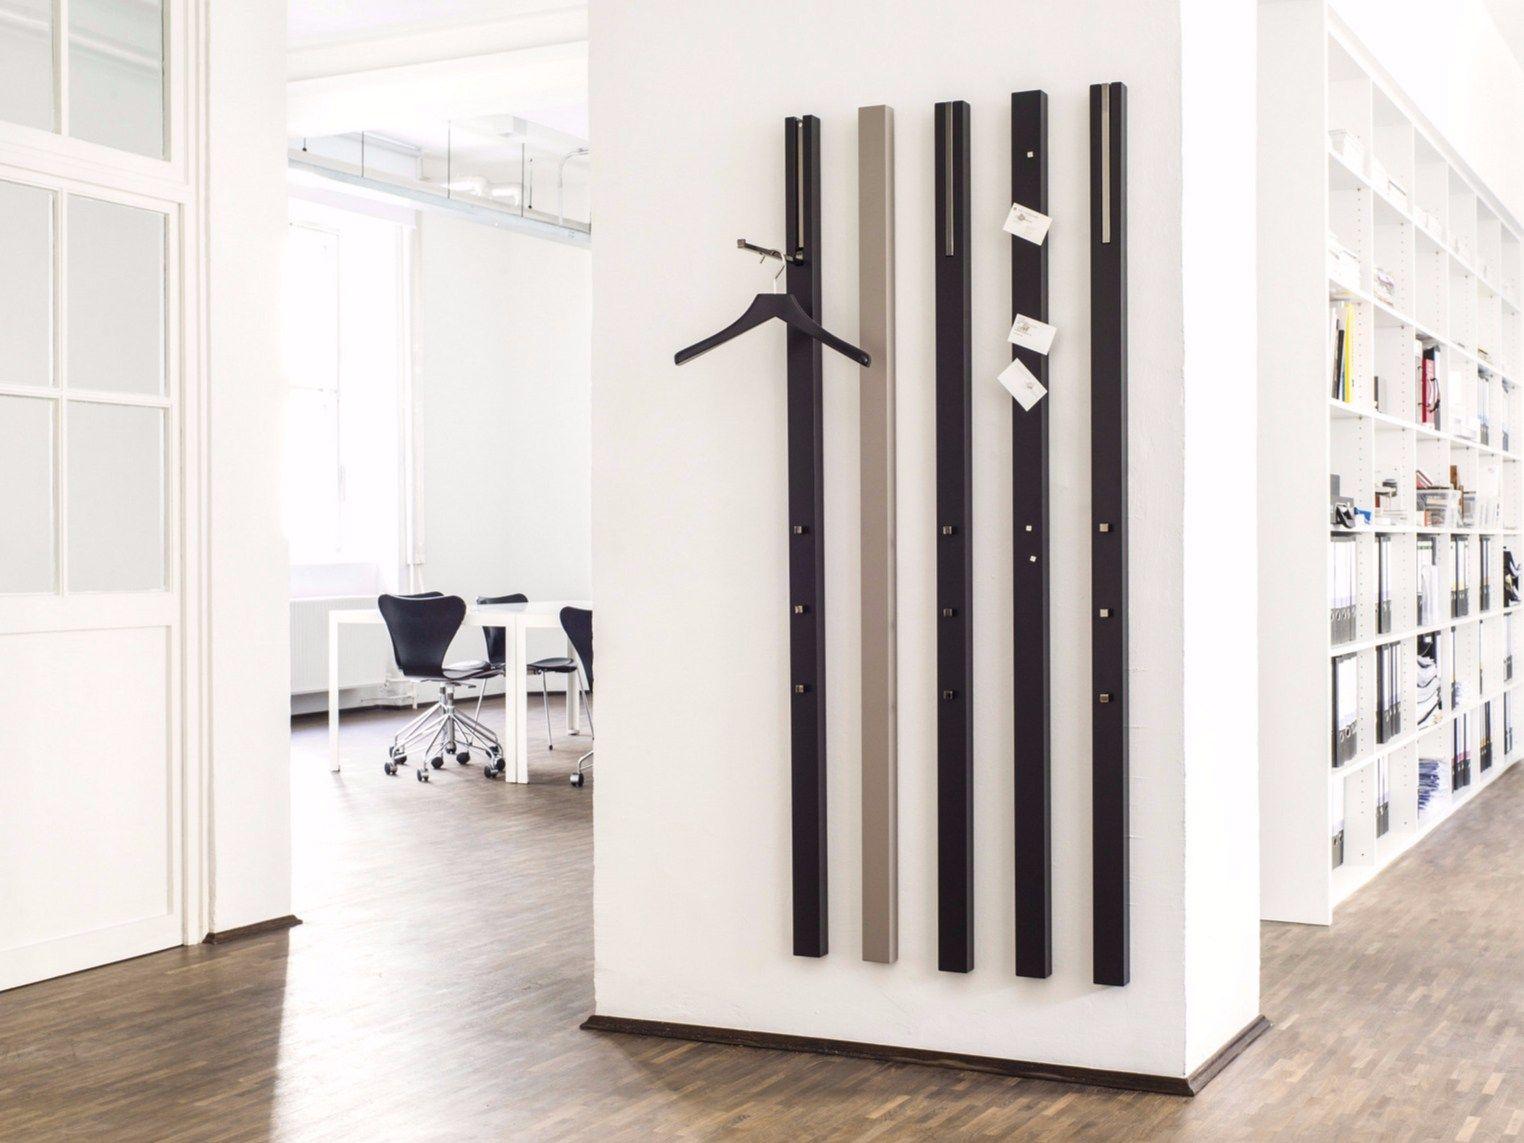 Line coat rack by sch nbuch design apartment 8 - Appendiabiti design a muro ...